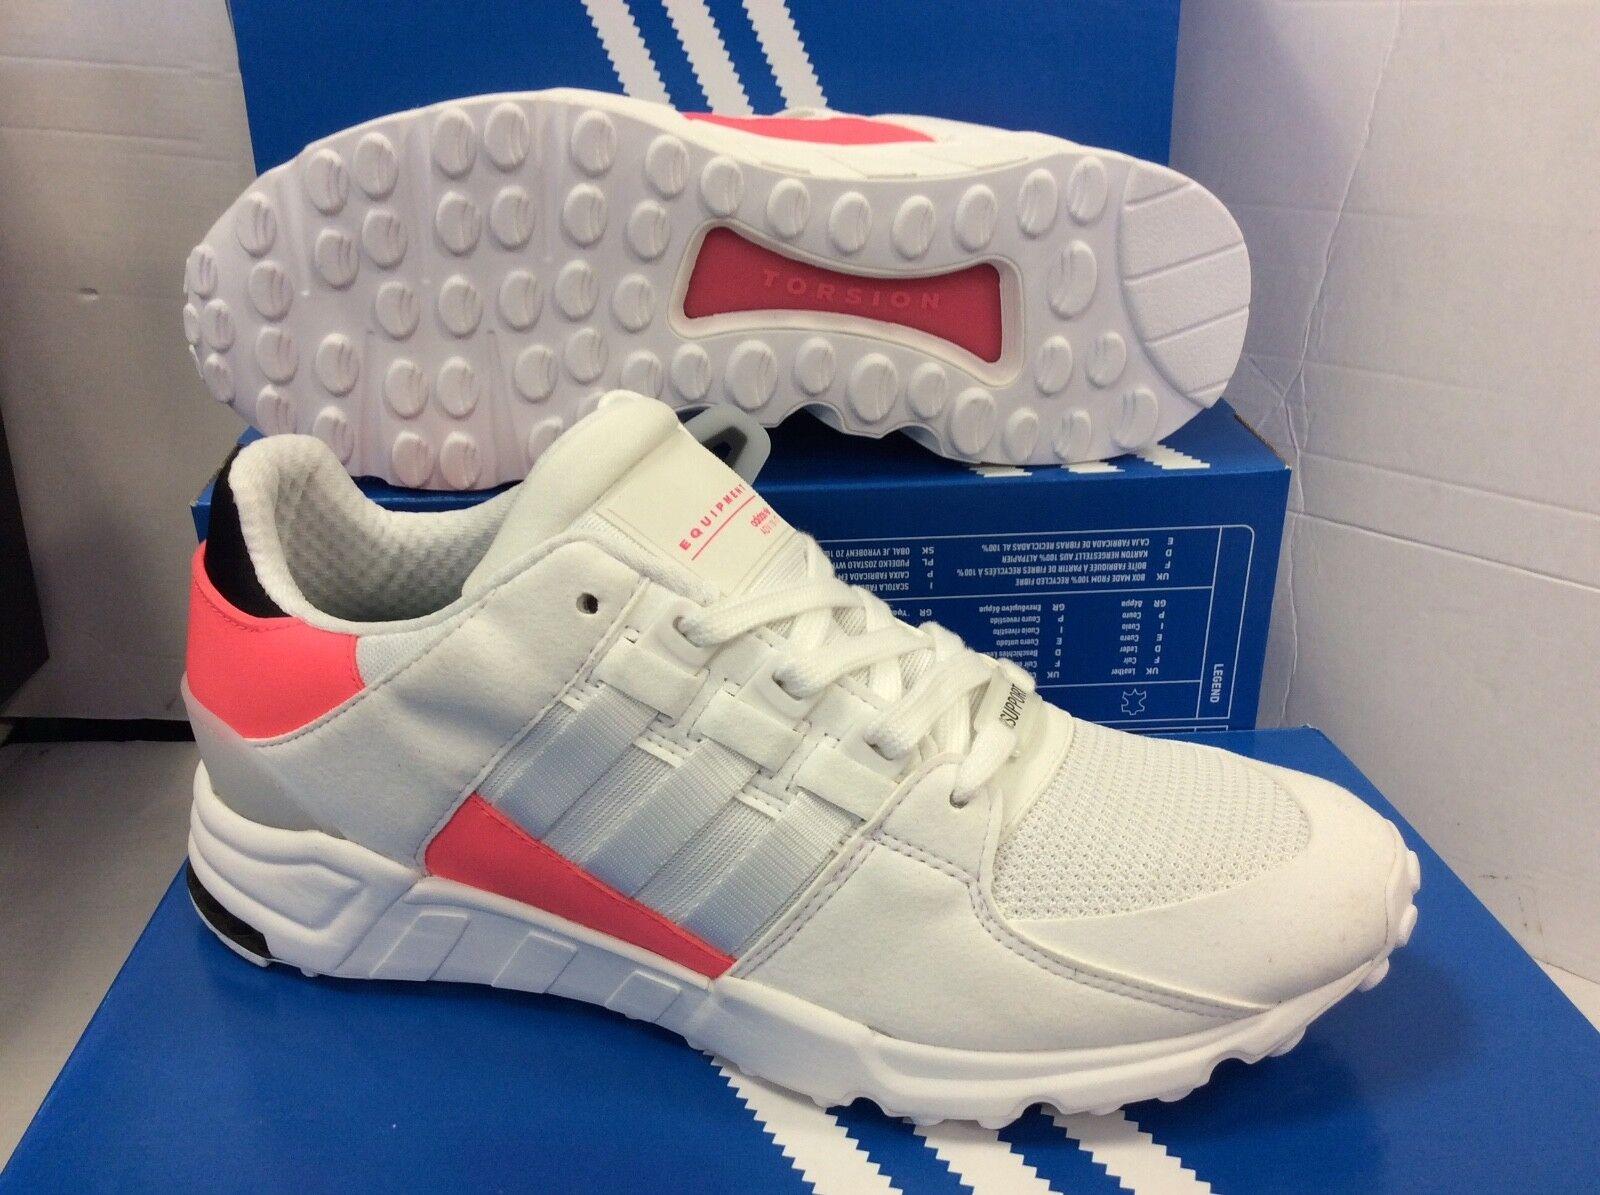 Adidas Originals EQT Support Uomo Scarpe da ginnastica RF BA7716, Taglia /EUR 44.5